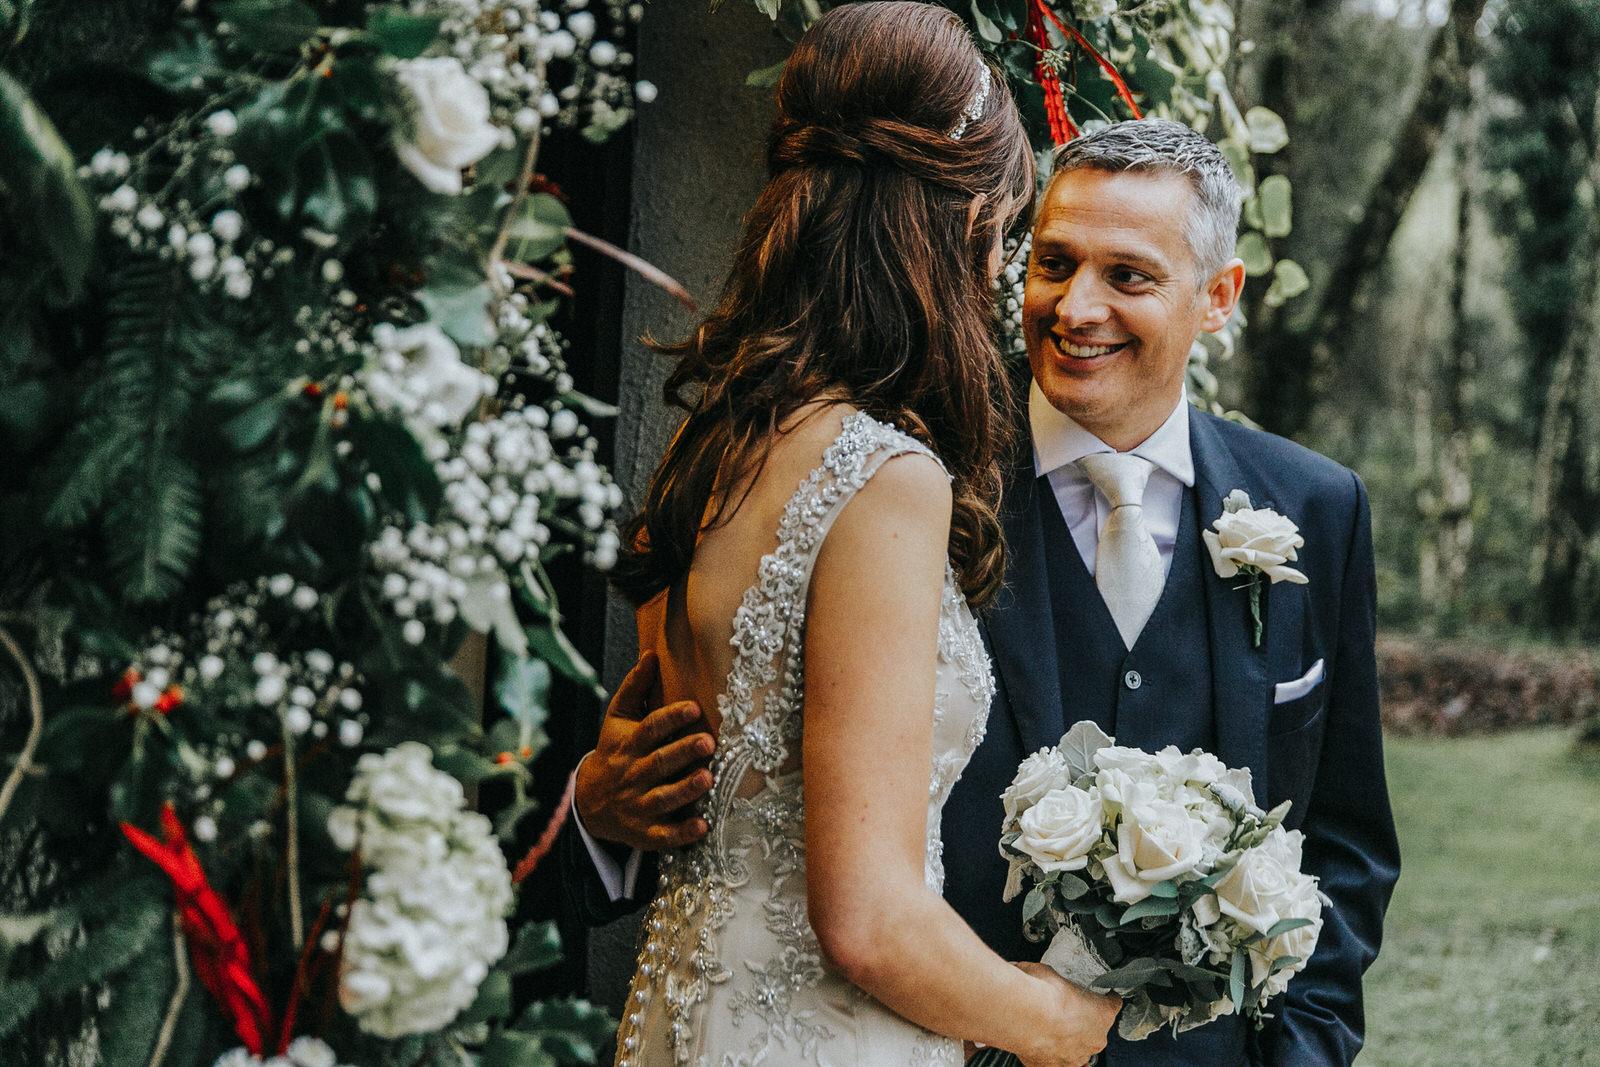 Roger_Kenny_wedding_photographer_Brooklodge__674.jpg